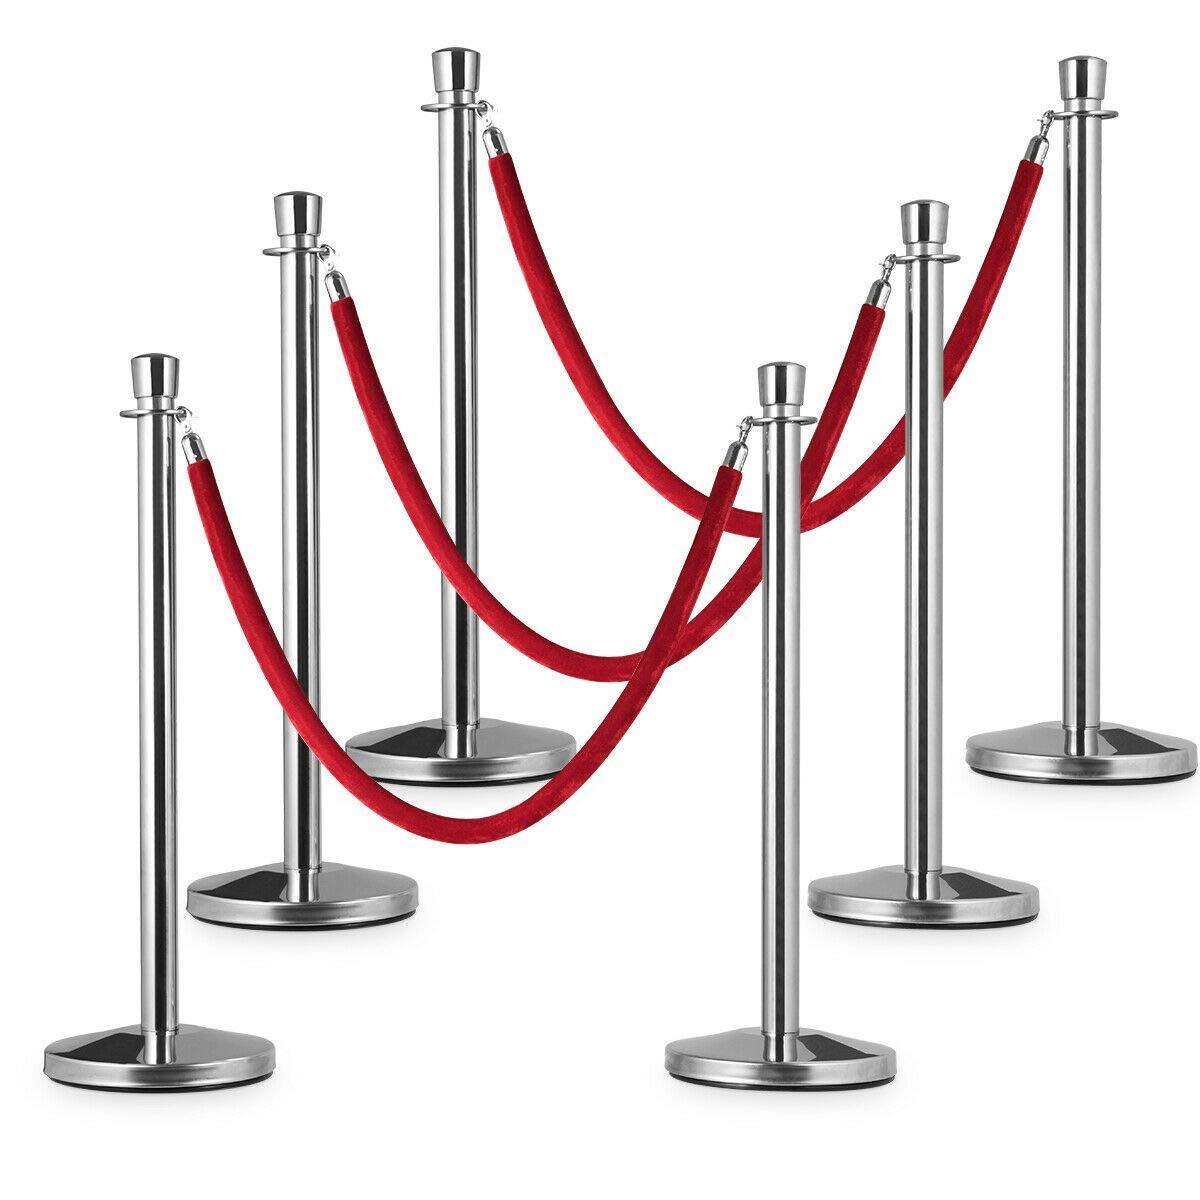 https://www.Ebay.com/itm/6Pcs-Stanchion-Posts-Queue-Pole-Retractable-3-Velvet-Ropes-Crowd-Control-Barrier/153491357586?Hash=item23bccc3f92:g:~hwAAOSwrLVc3S7h&frcectupt=True